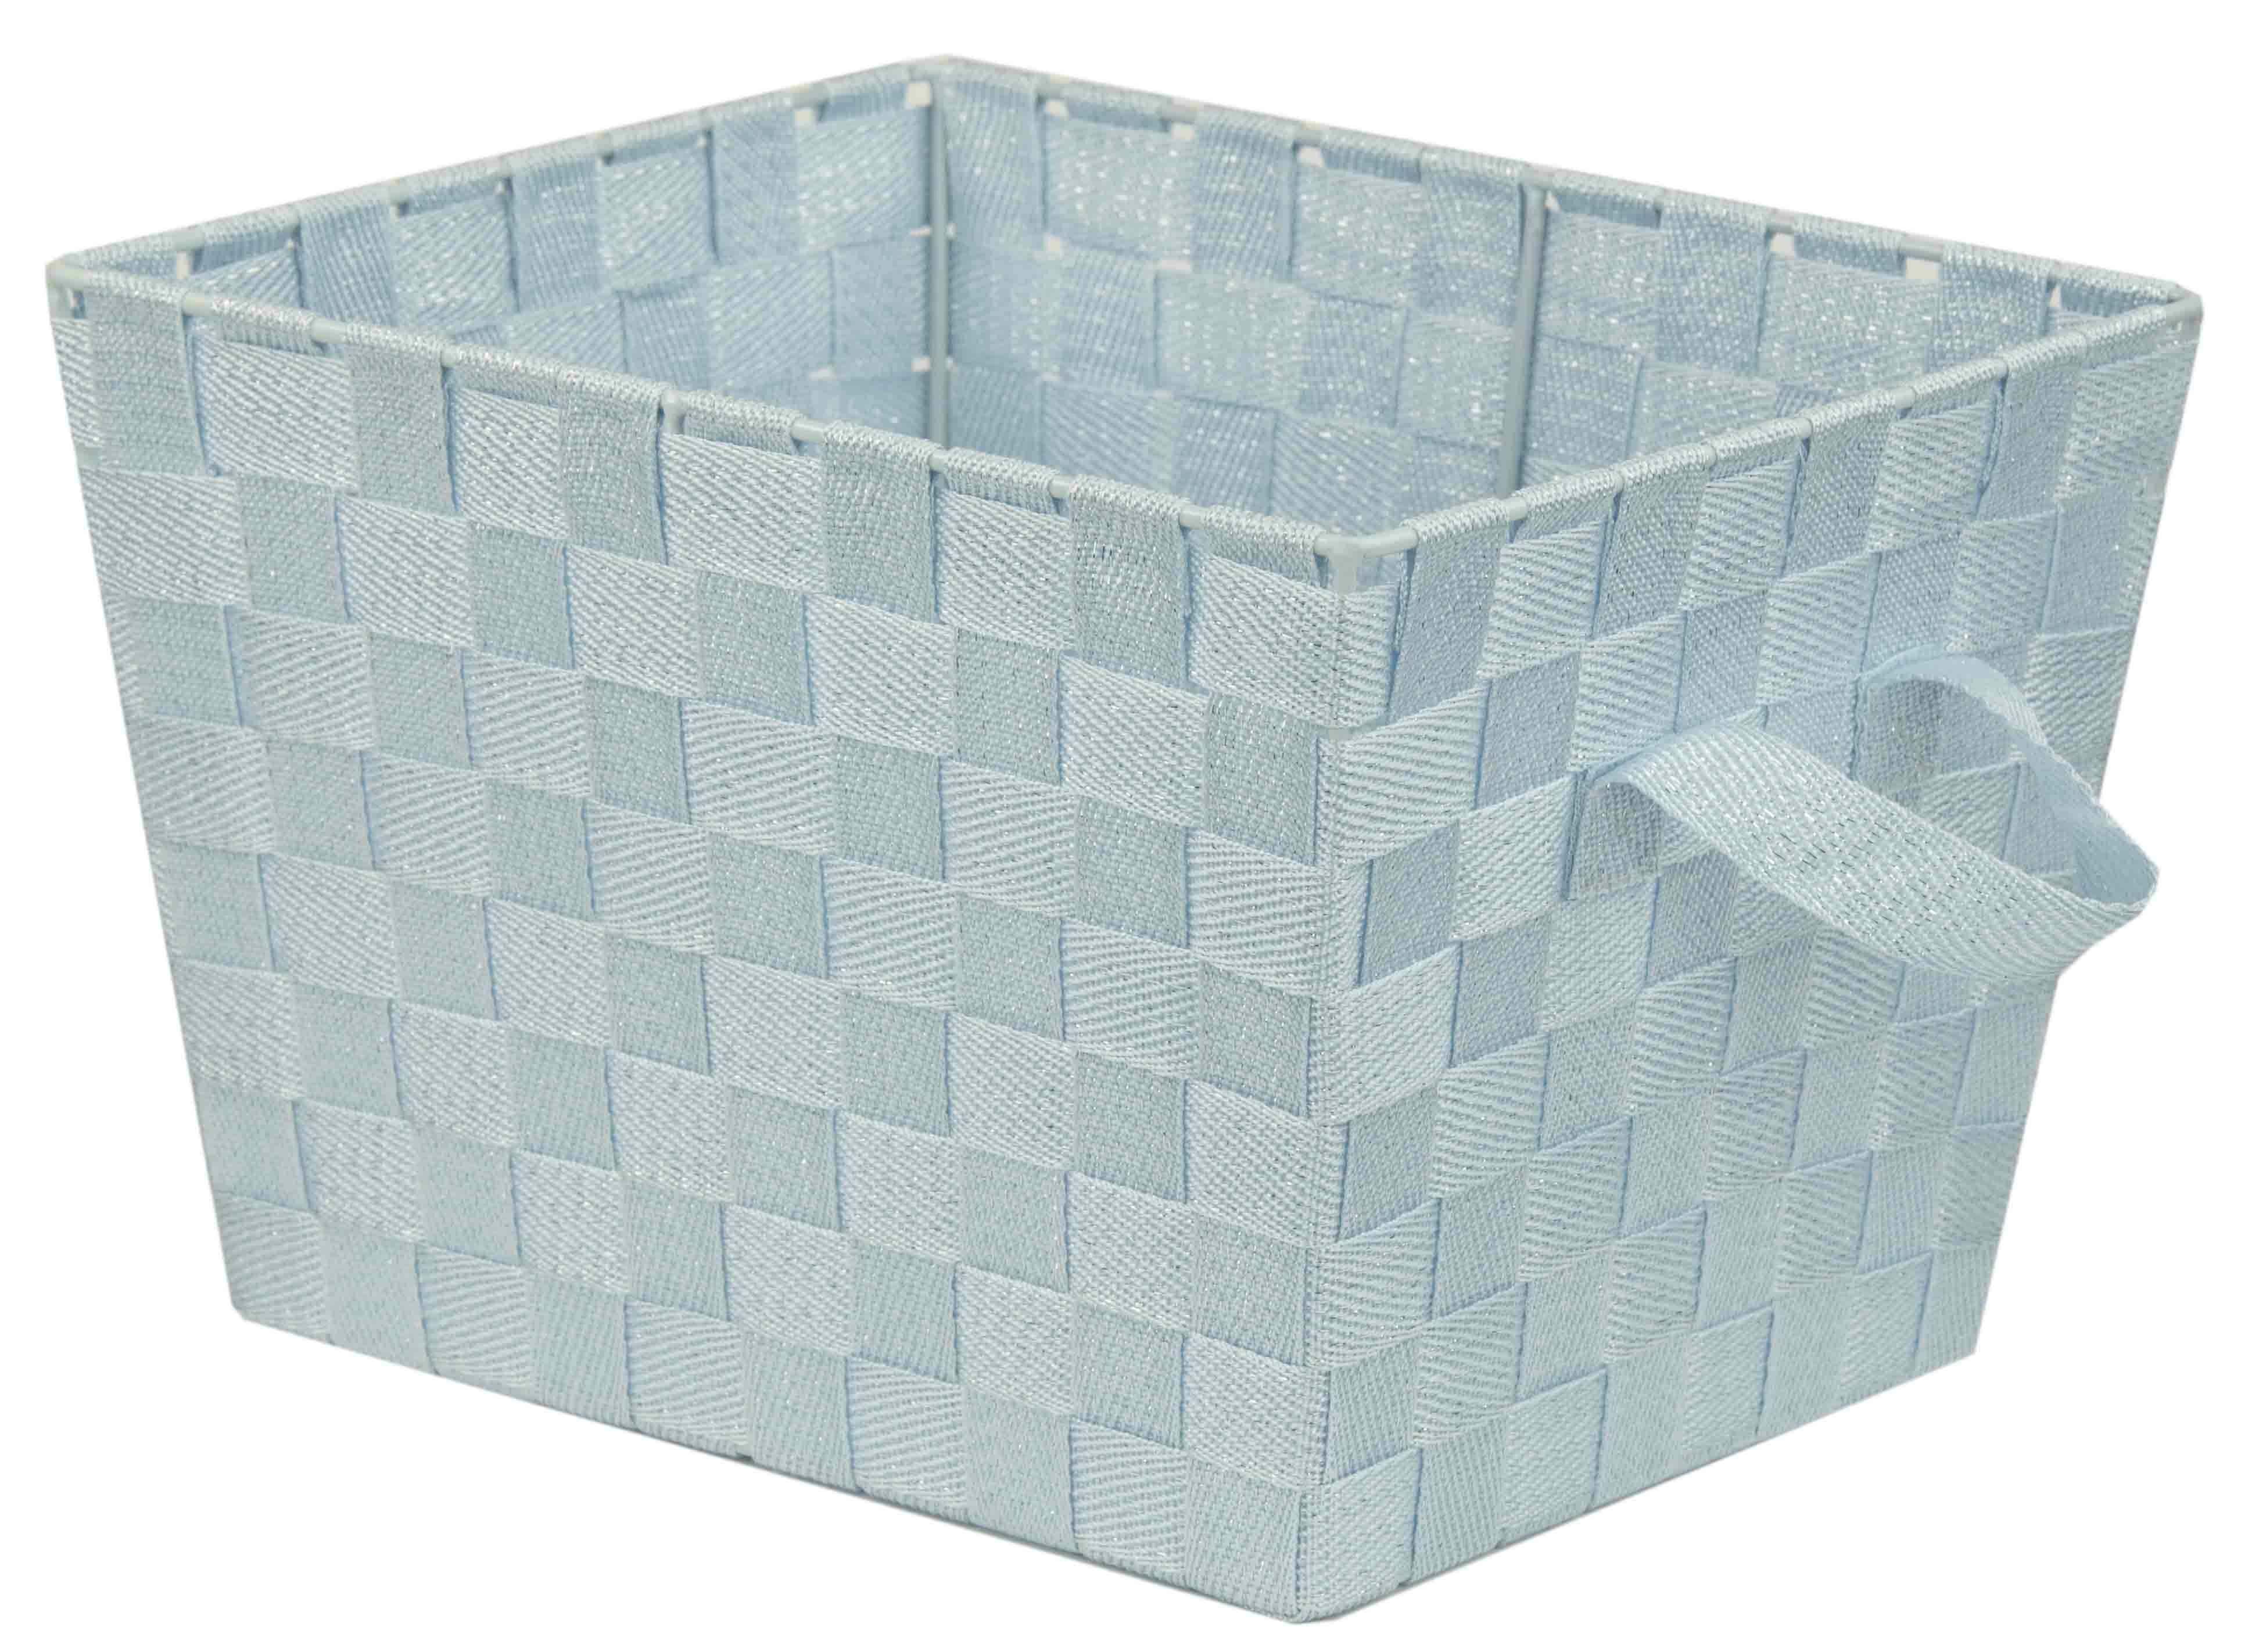 sc 1 st  Wayfair & Rebrilliant Strap Handle Non-Woven Storage Basket u0026 Reviews | Wayfair